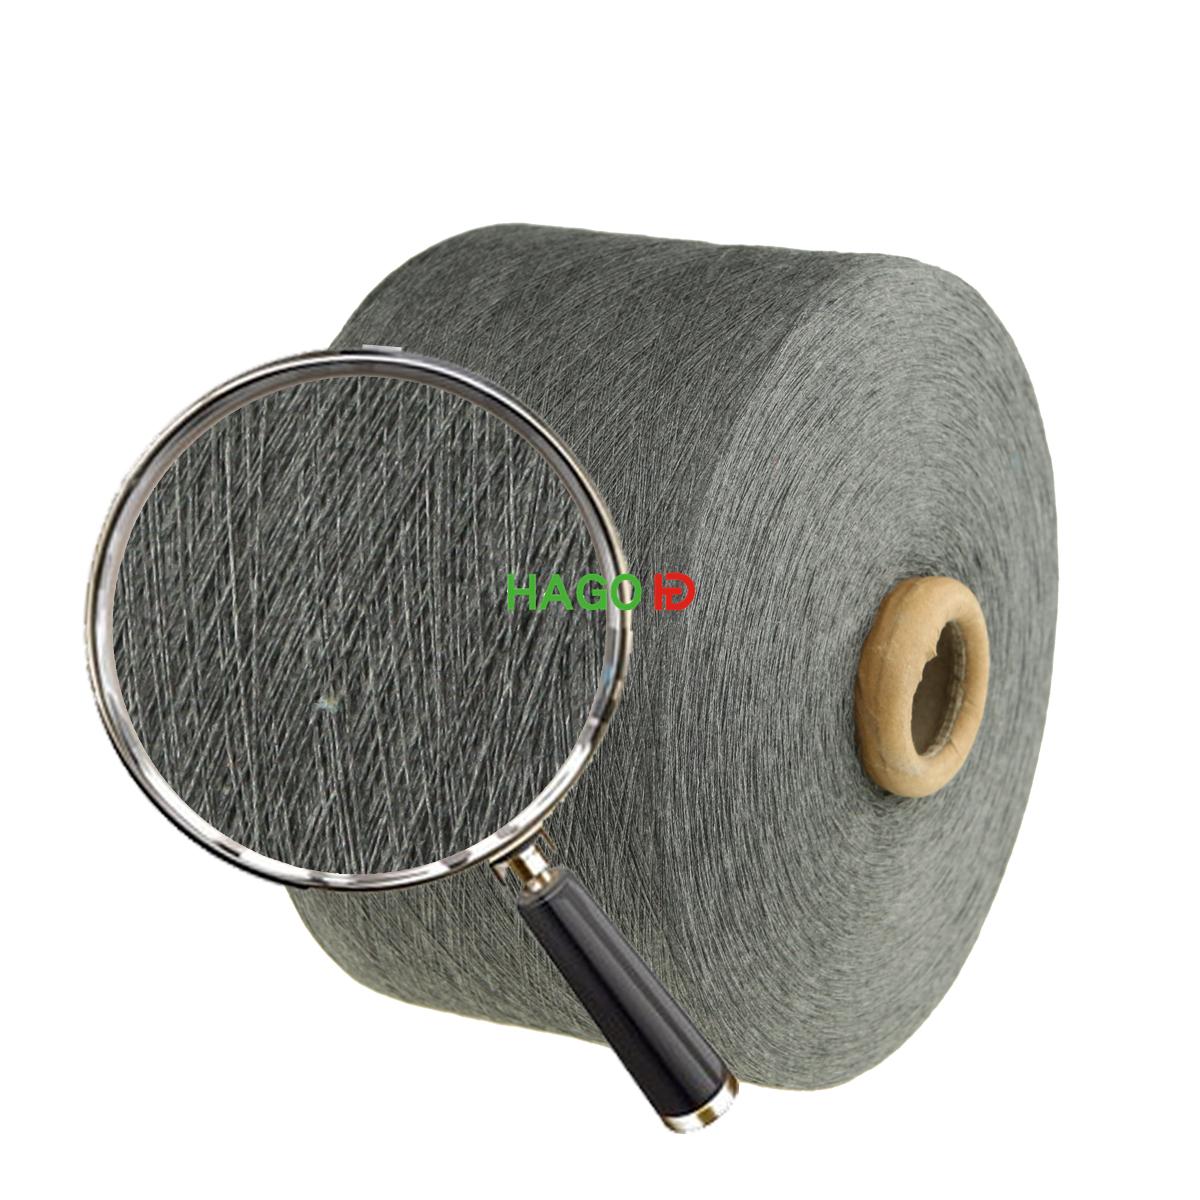 Regenerated cotton yarn for knitting gloves socks, fabric